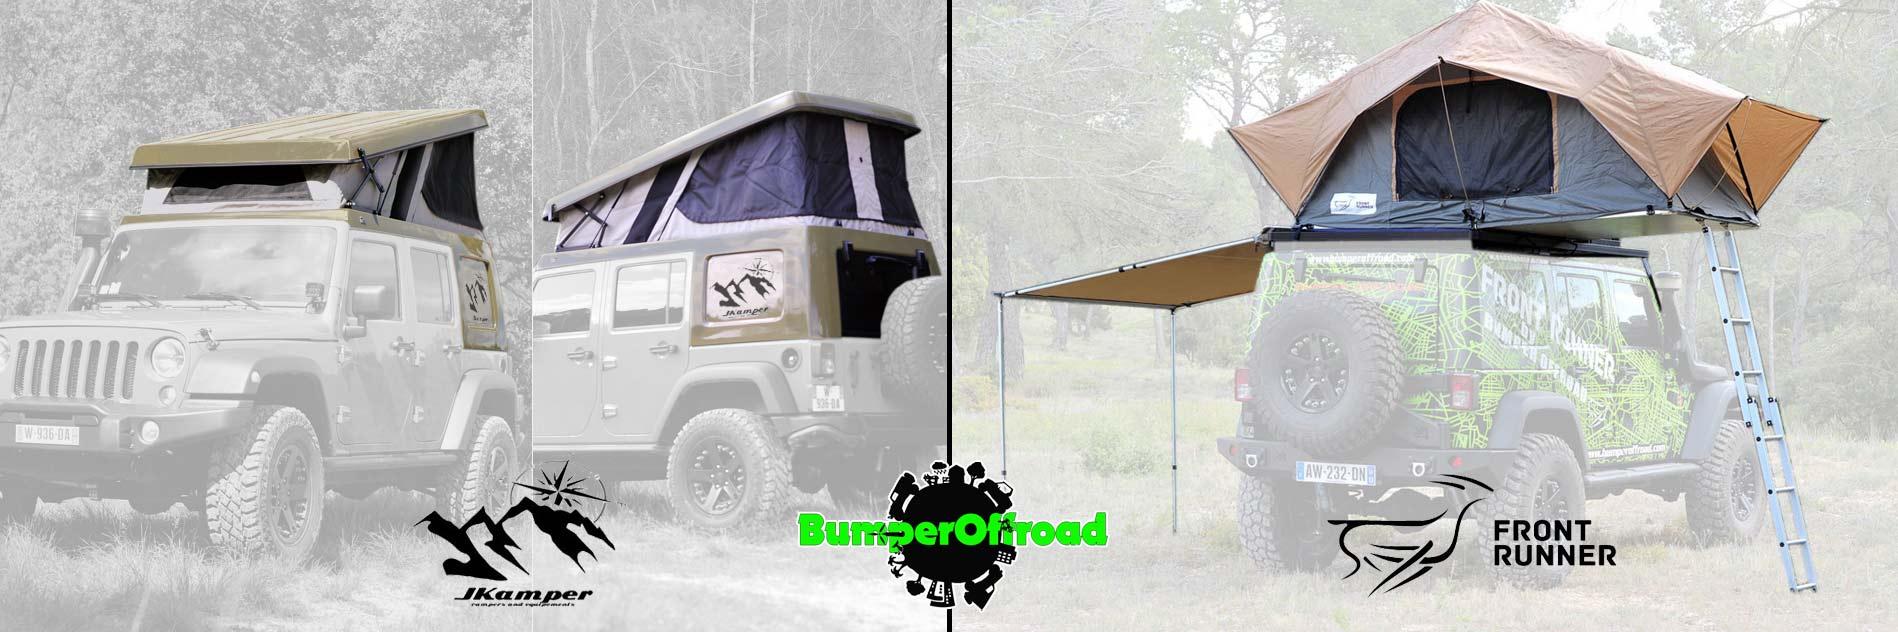 Location tente de toit bumper offroad bumper off road - Location echelle de toit ...